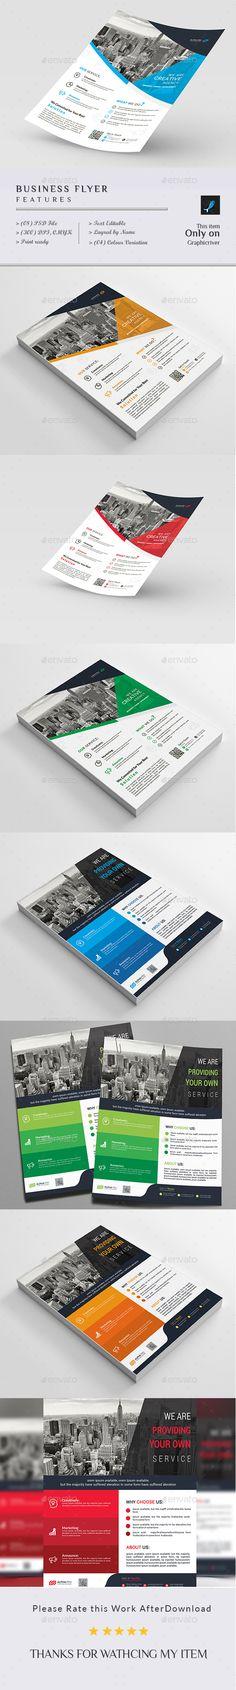 Creative Business Flyer Templates PSD Bundle